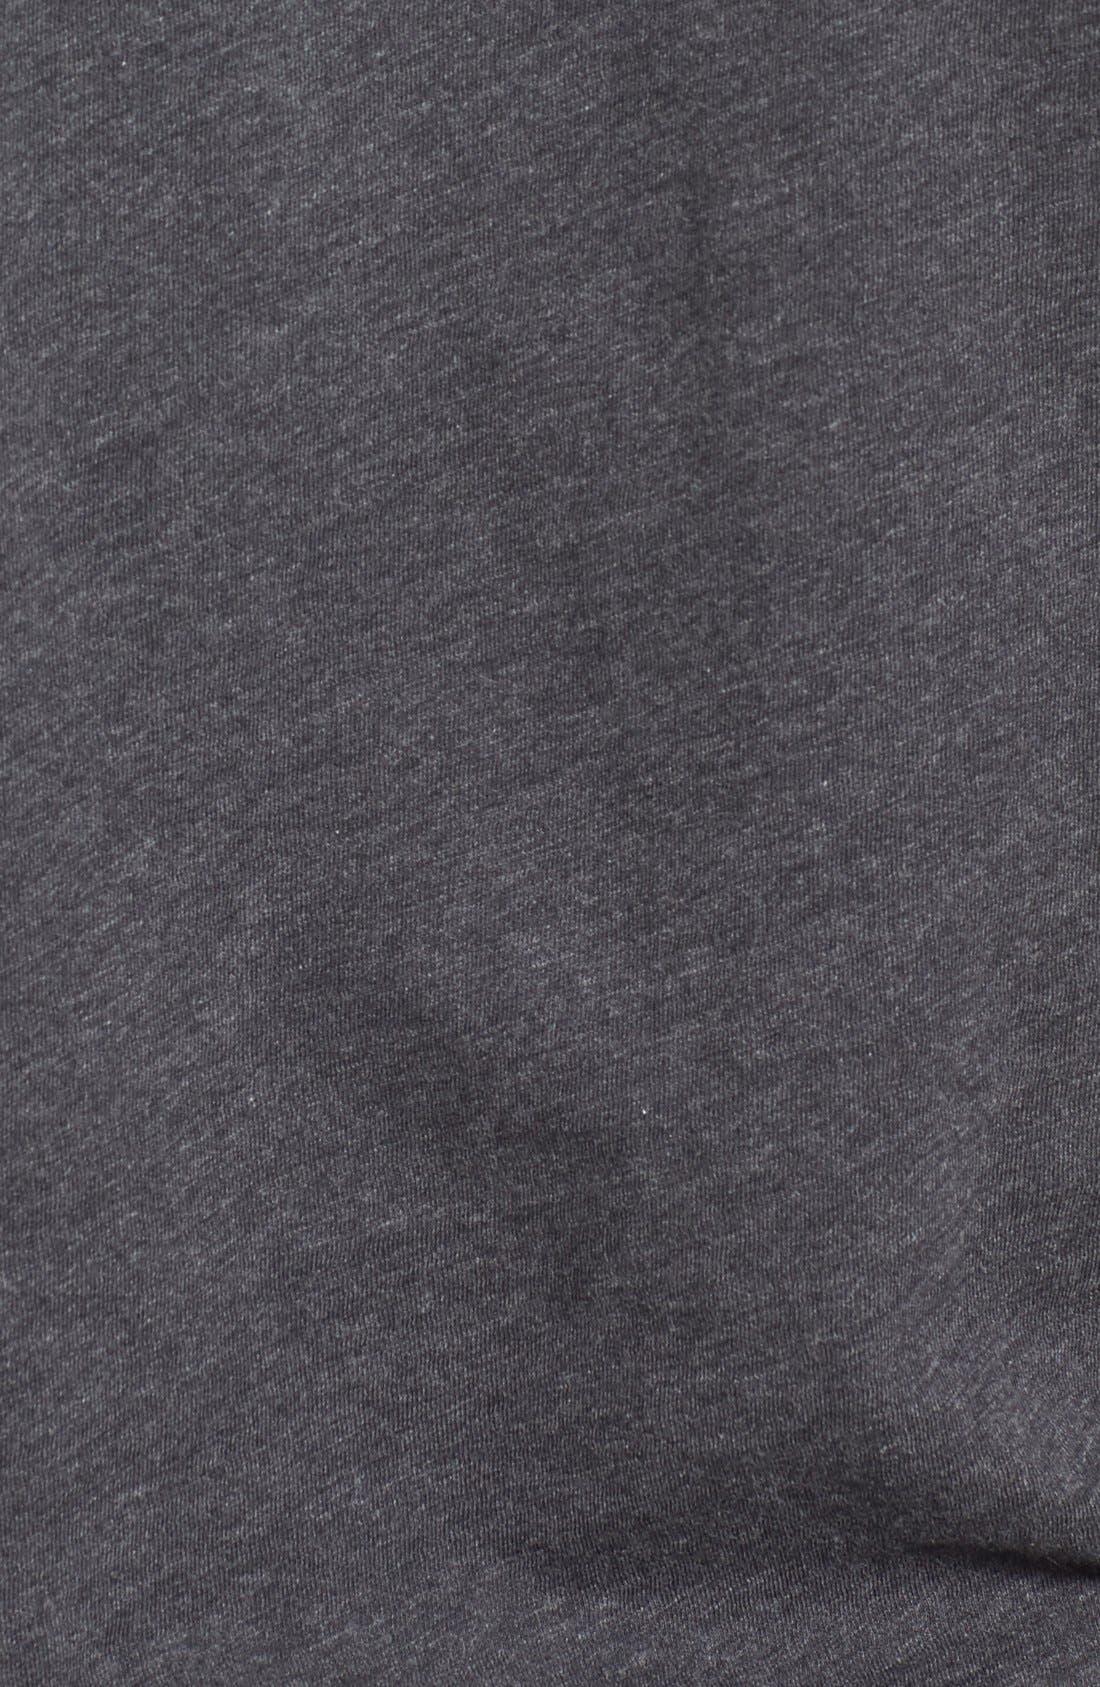 'Bing' V-Neck Pocket T-Shirt,                             Alternate thumbnail 5, color,                             Dark Charcoal Heather